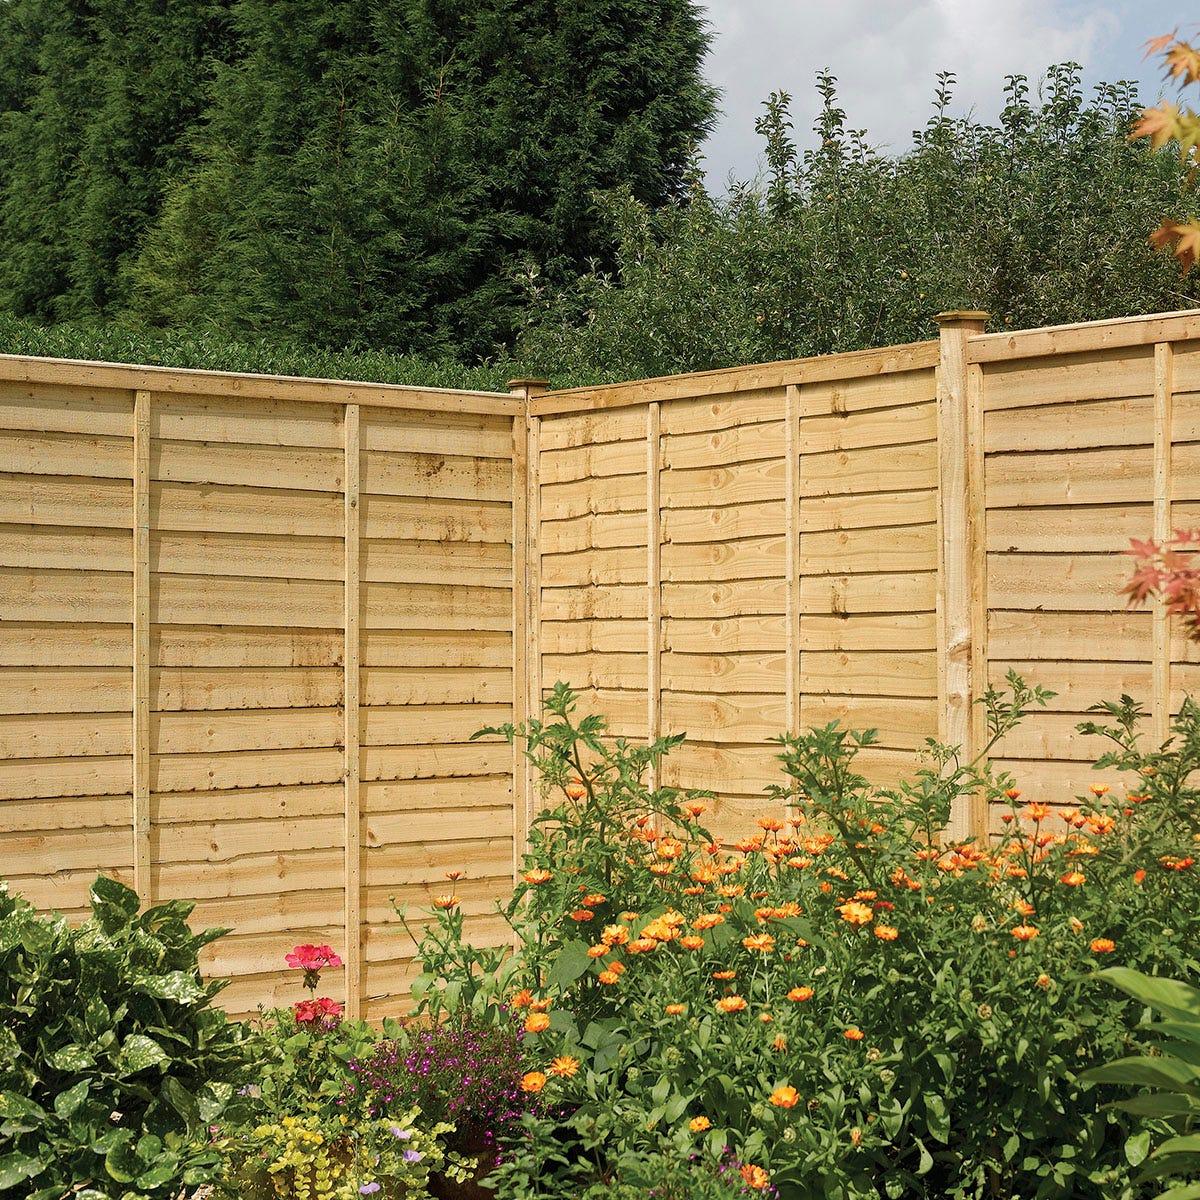 Rowlinson 3pk Lap Panel Pressure Treated Fence - 6x4